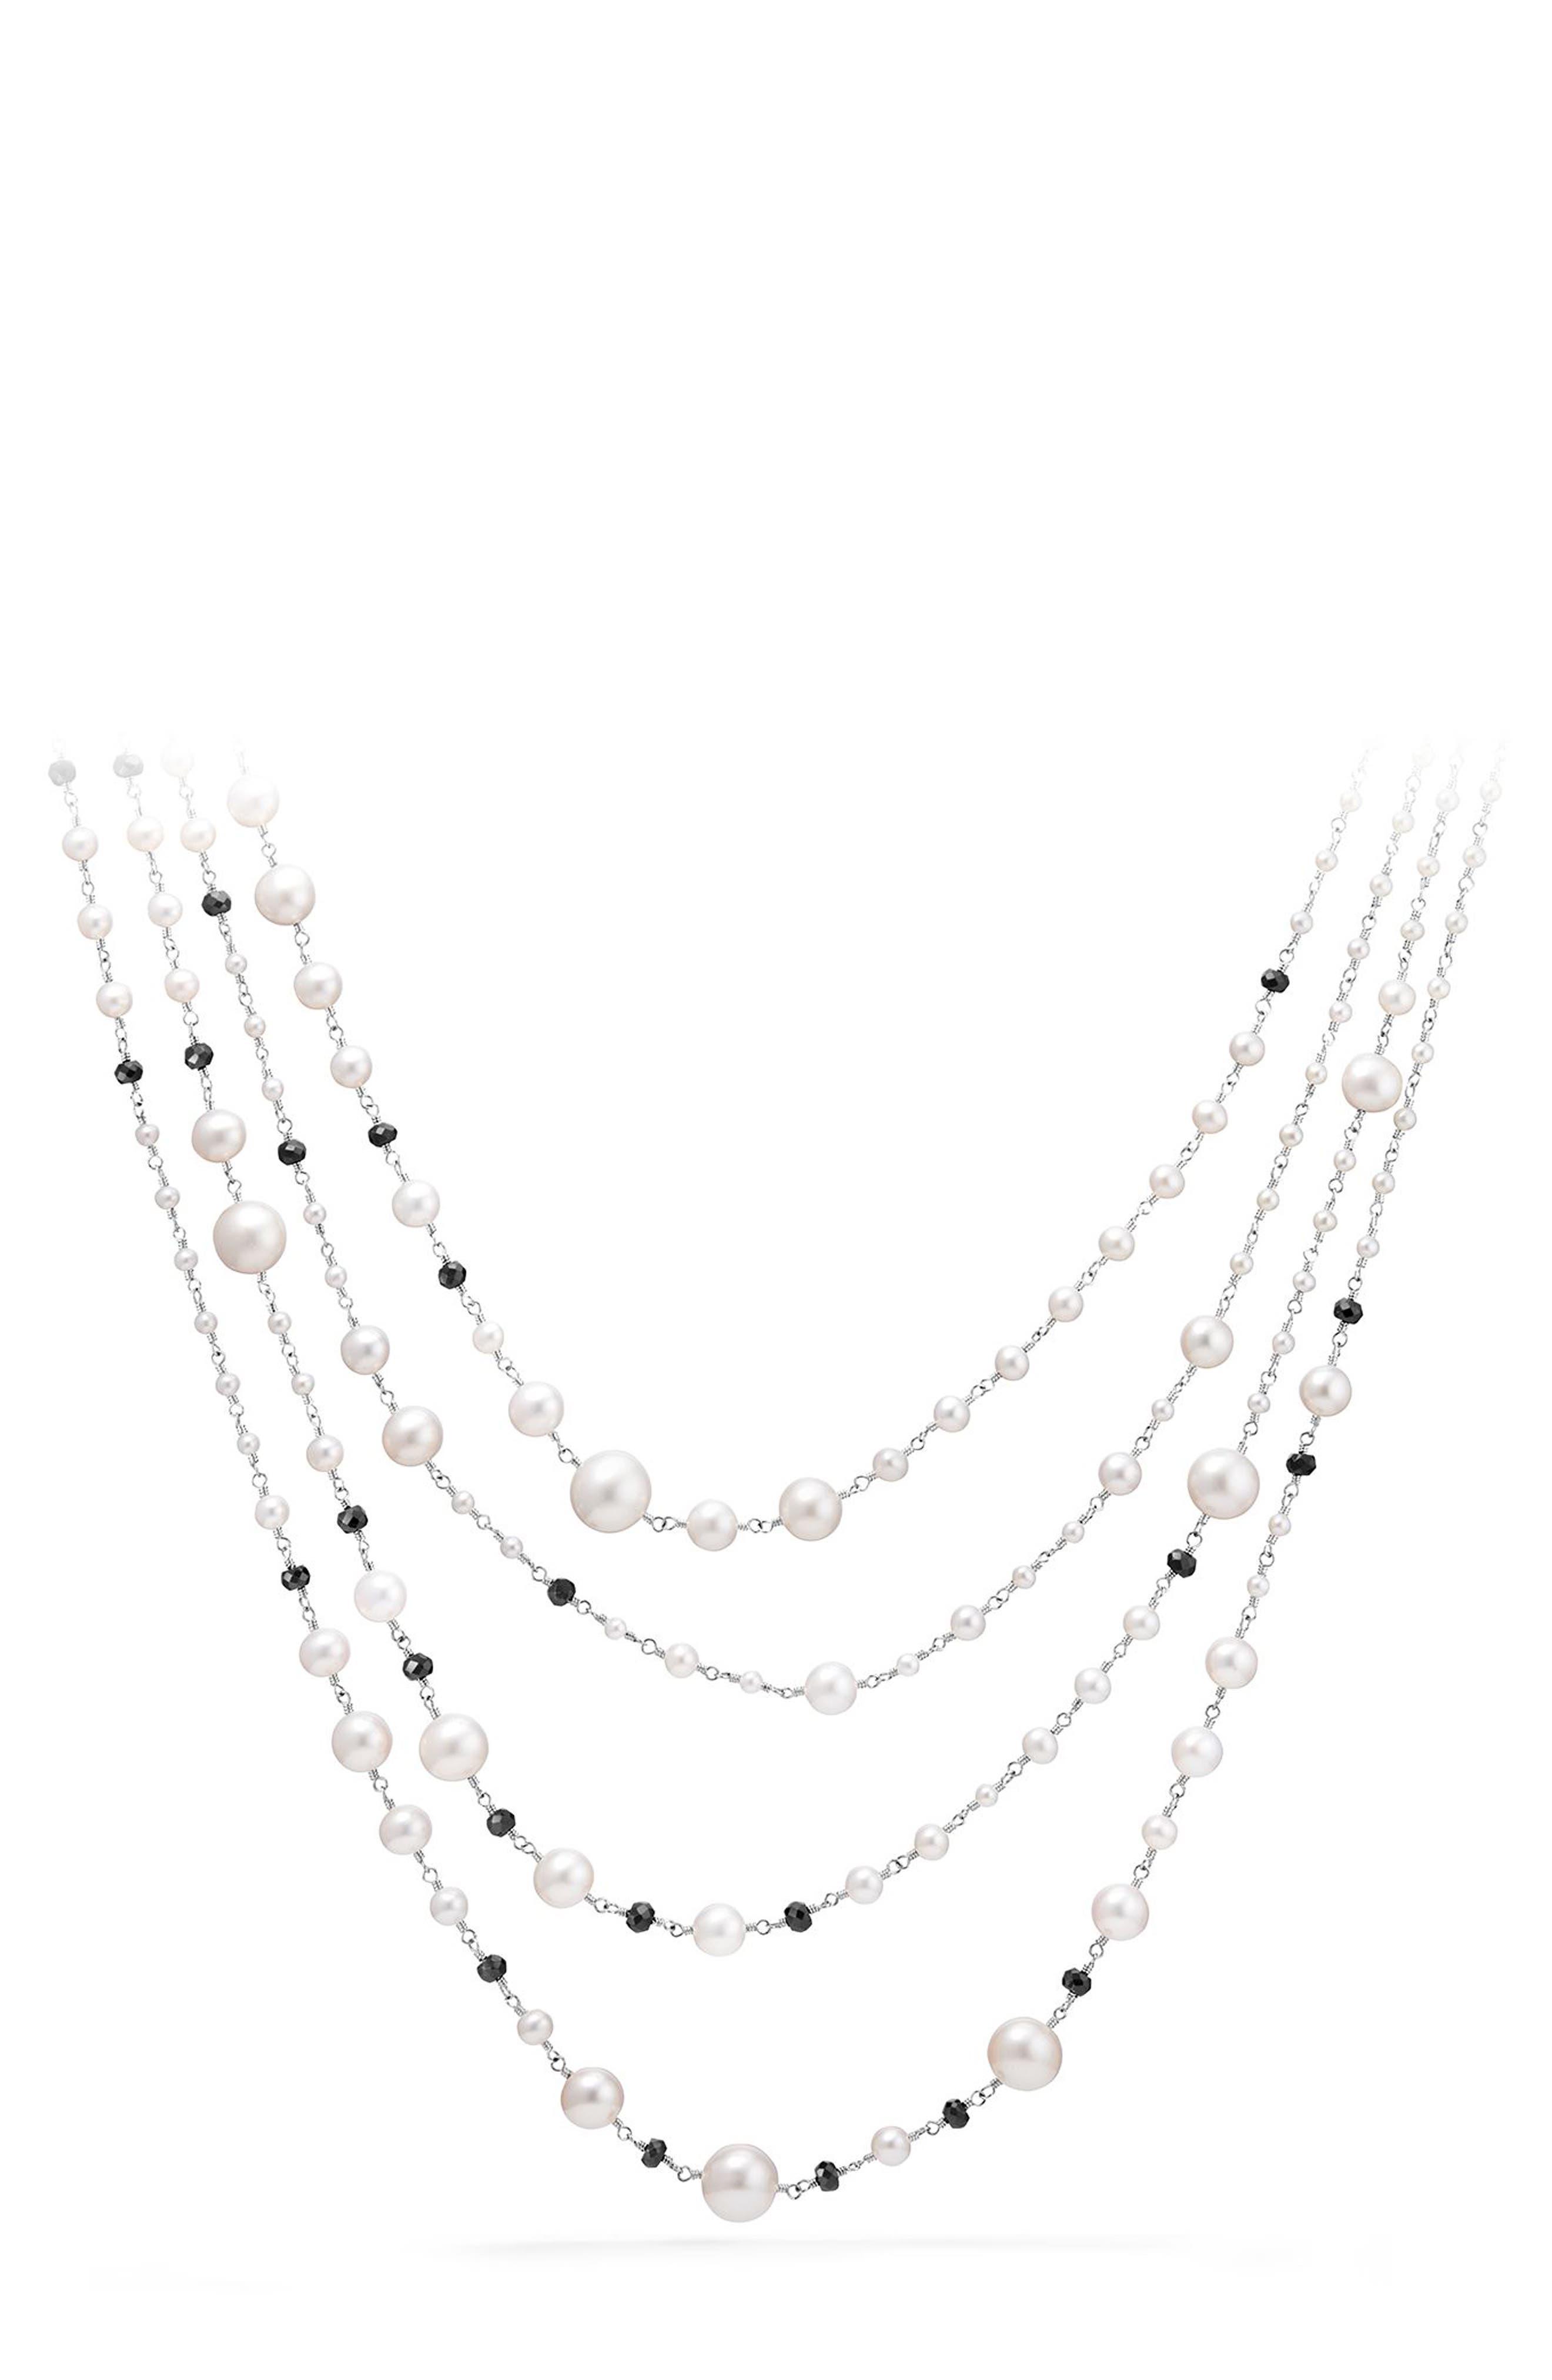 Solari Pearl & Bead Multistrand Necklace,                         Main,                         color, Pearl/ Black Spinel